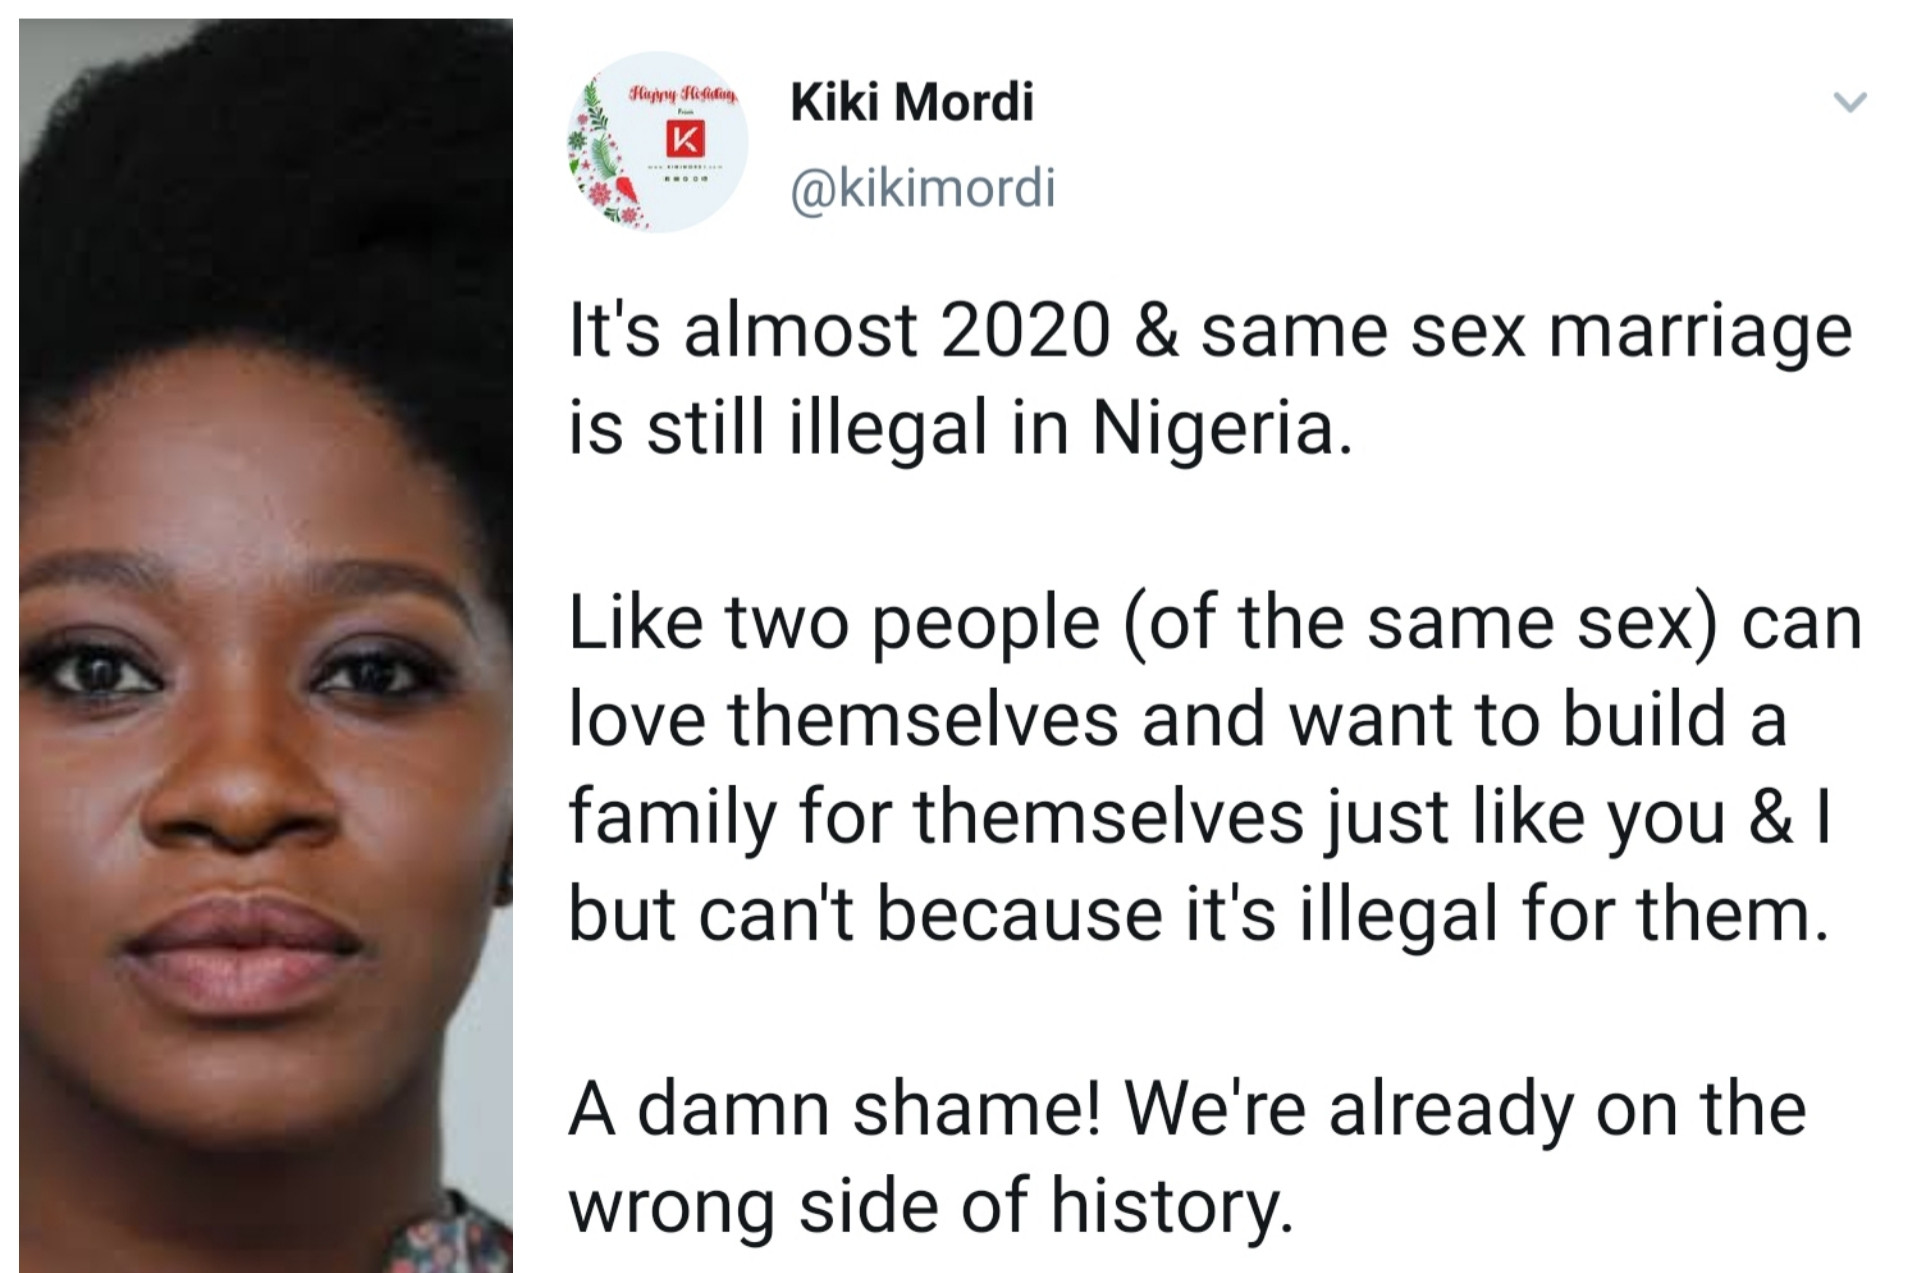 It's Shameful That Same S•x Marriage Is Still Illegal In Nigeria — Journalist Kiki Mordi